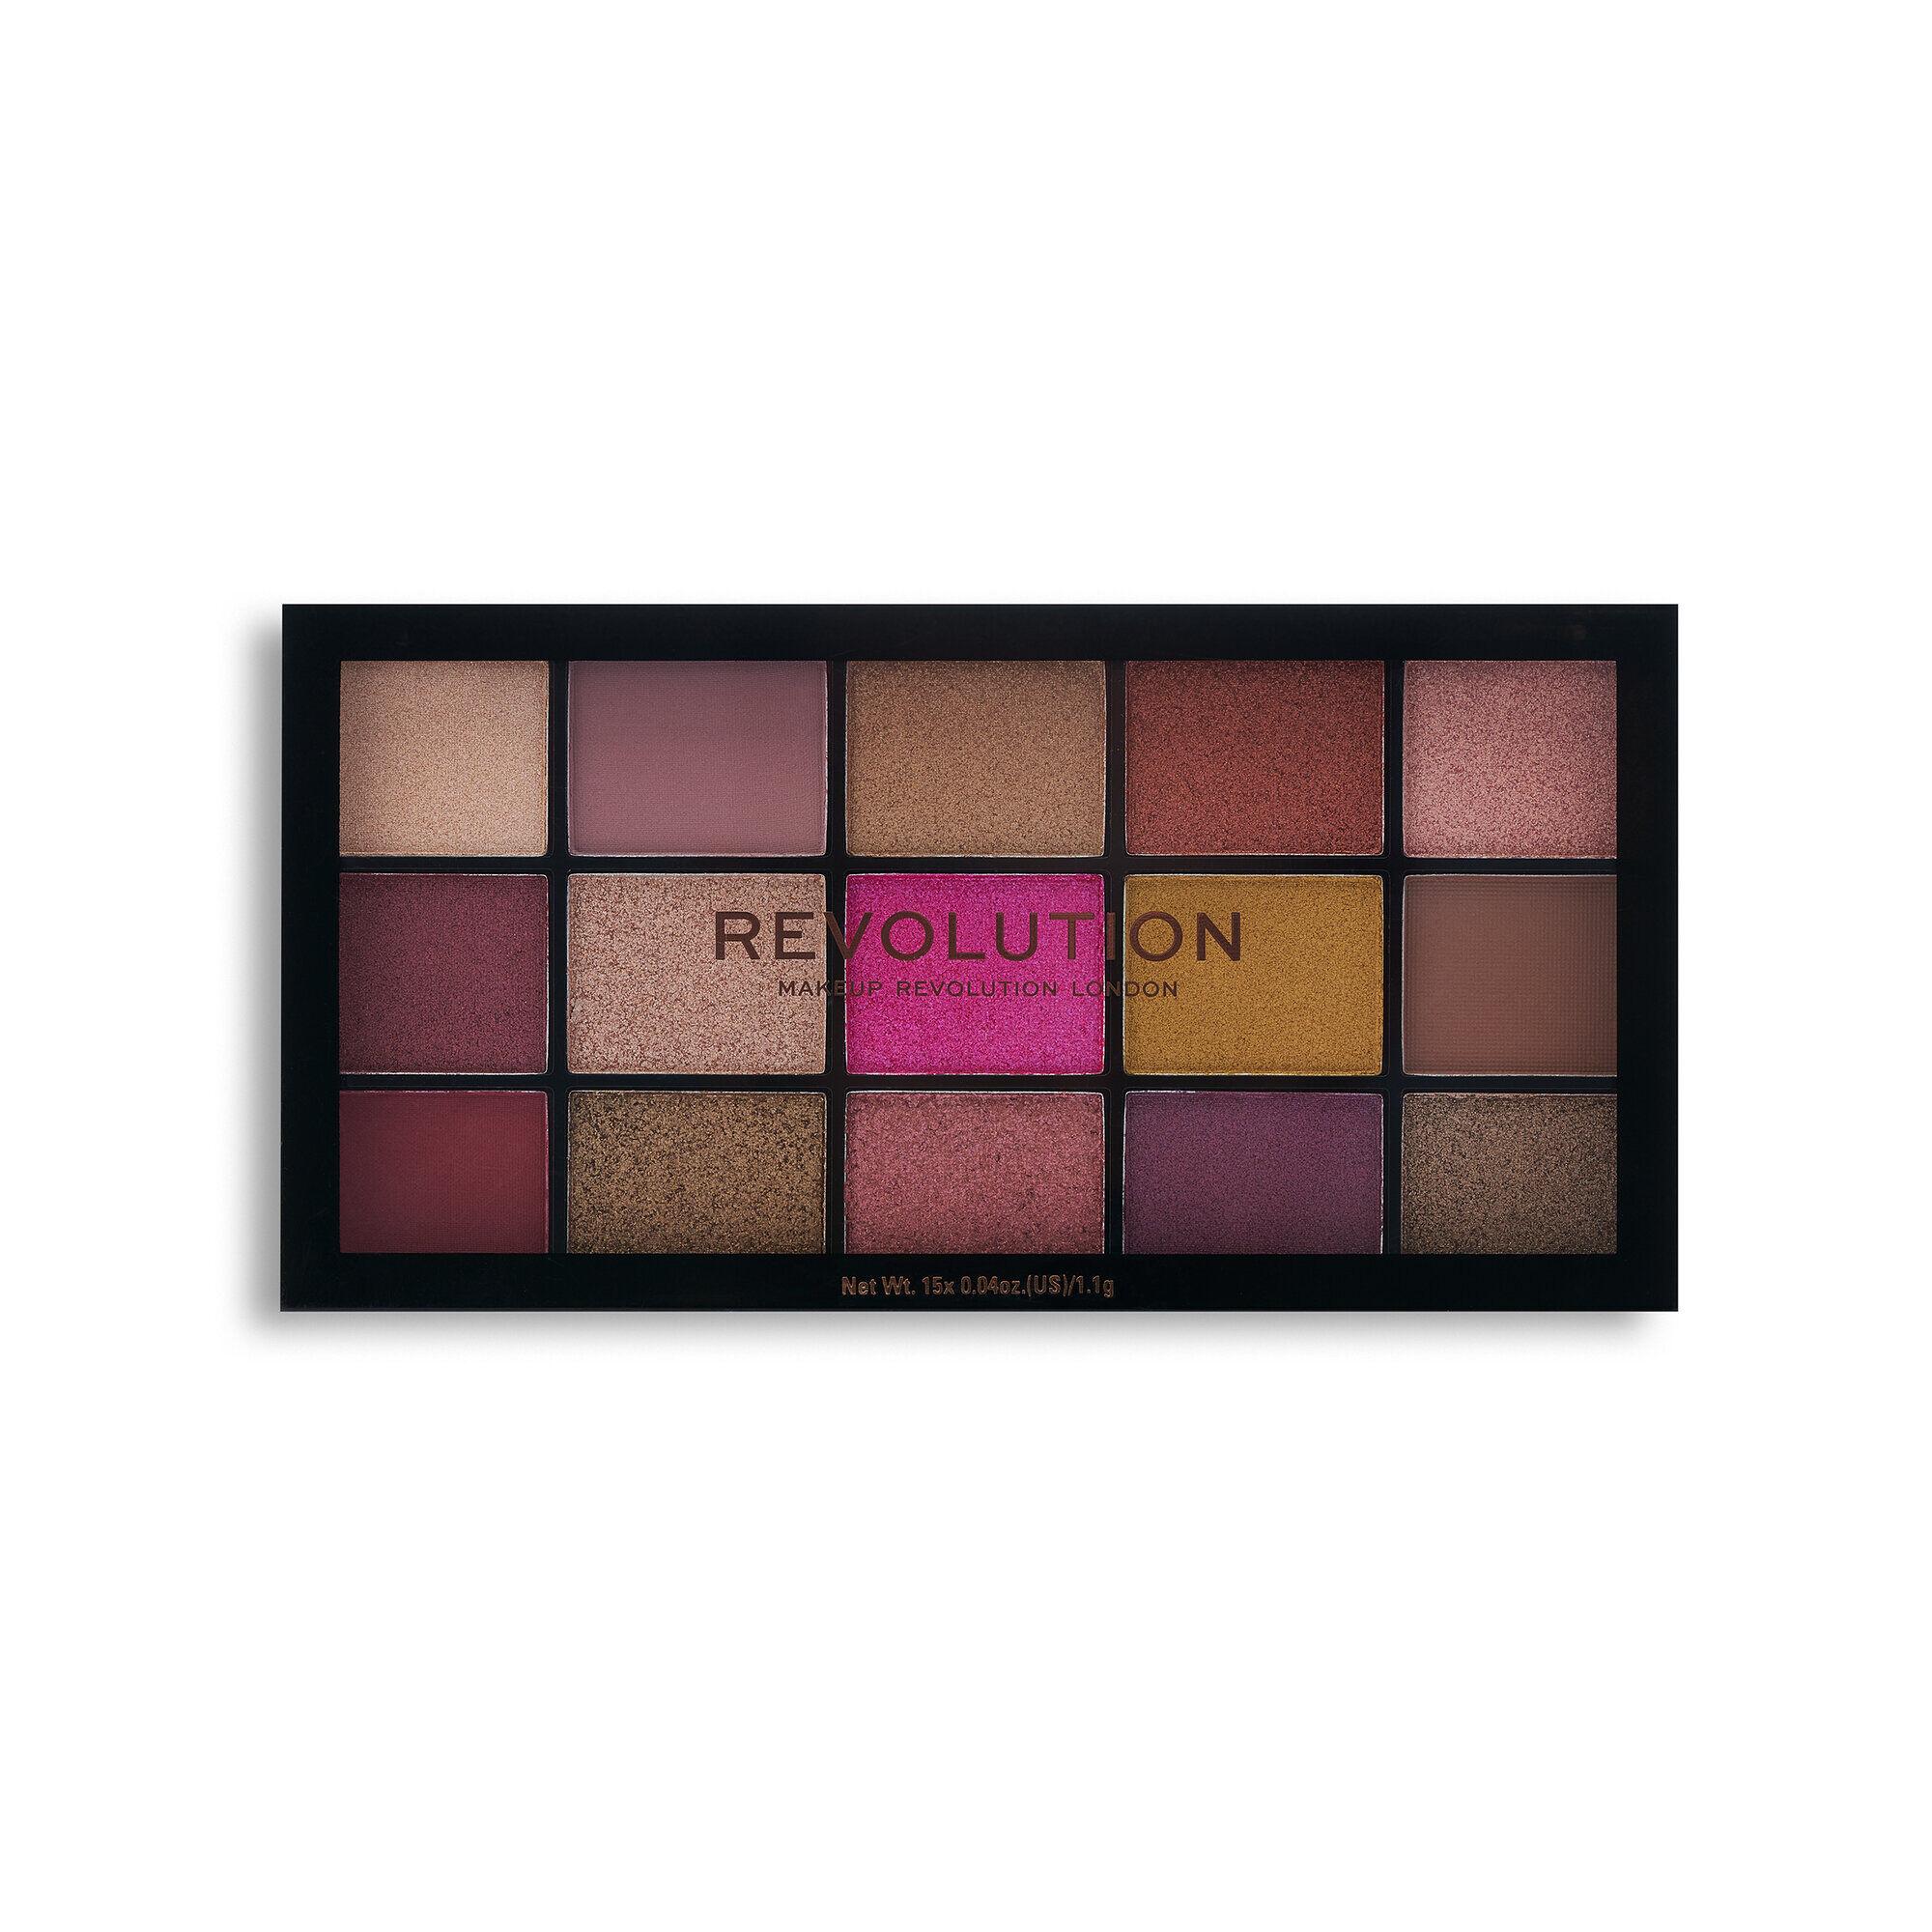 Revolution Prestige Reloaded Eyeshadow Palette